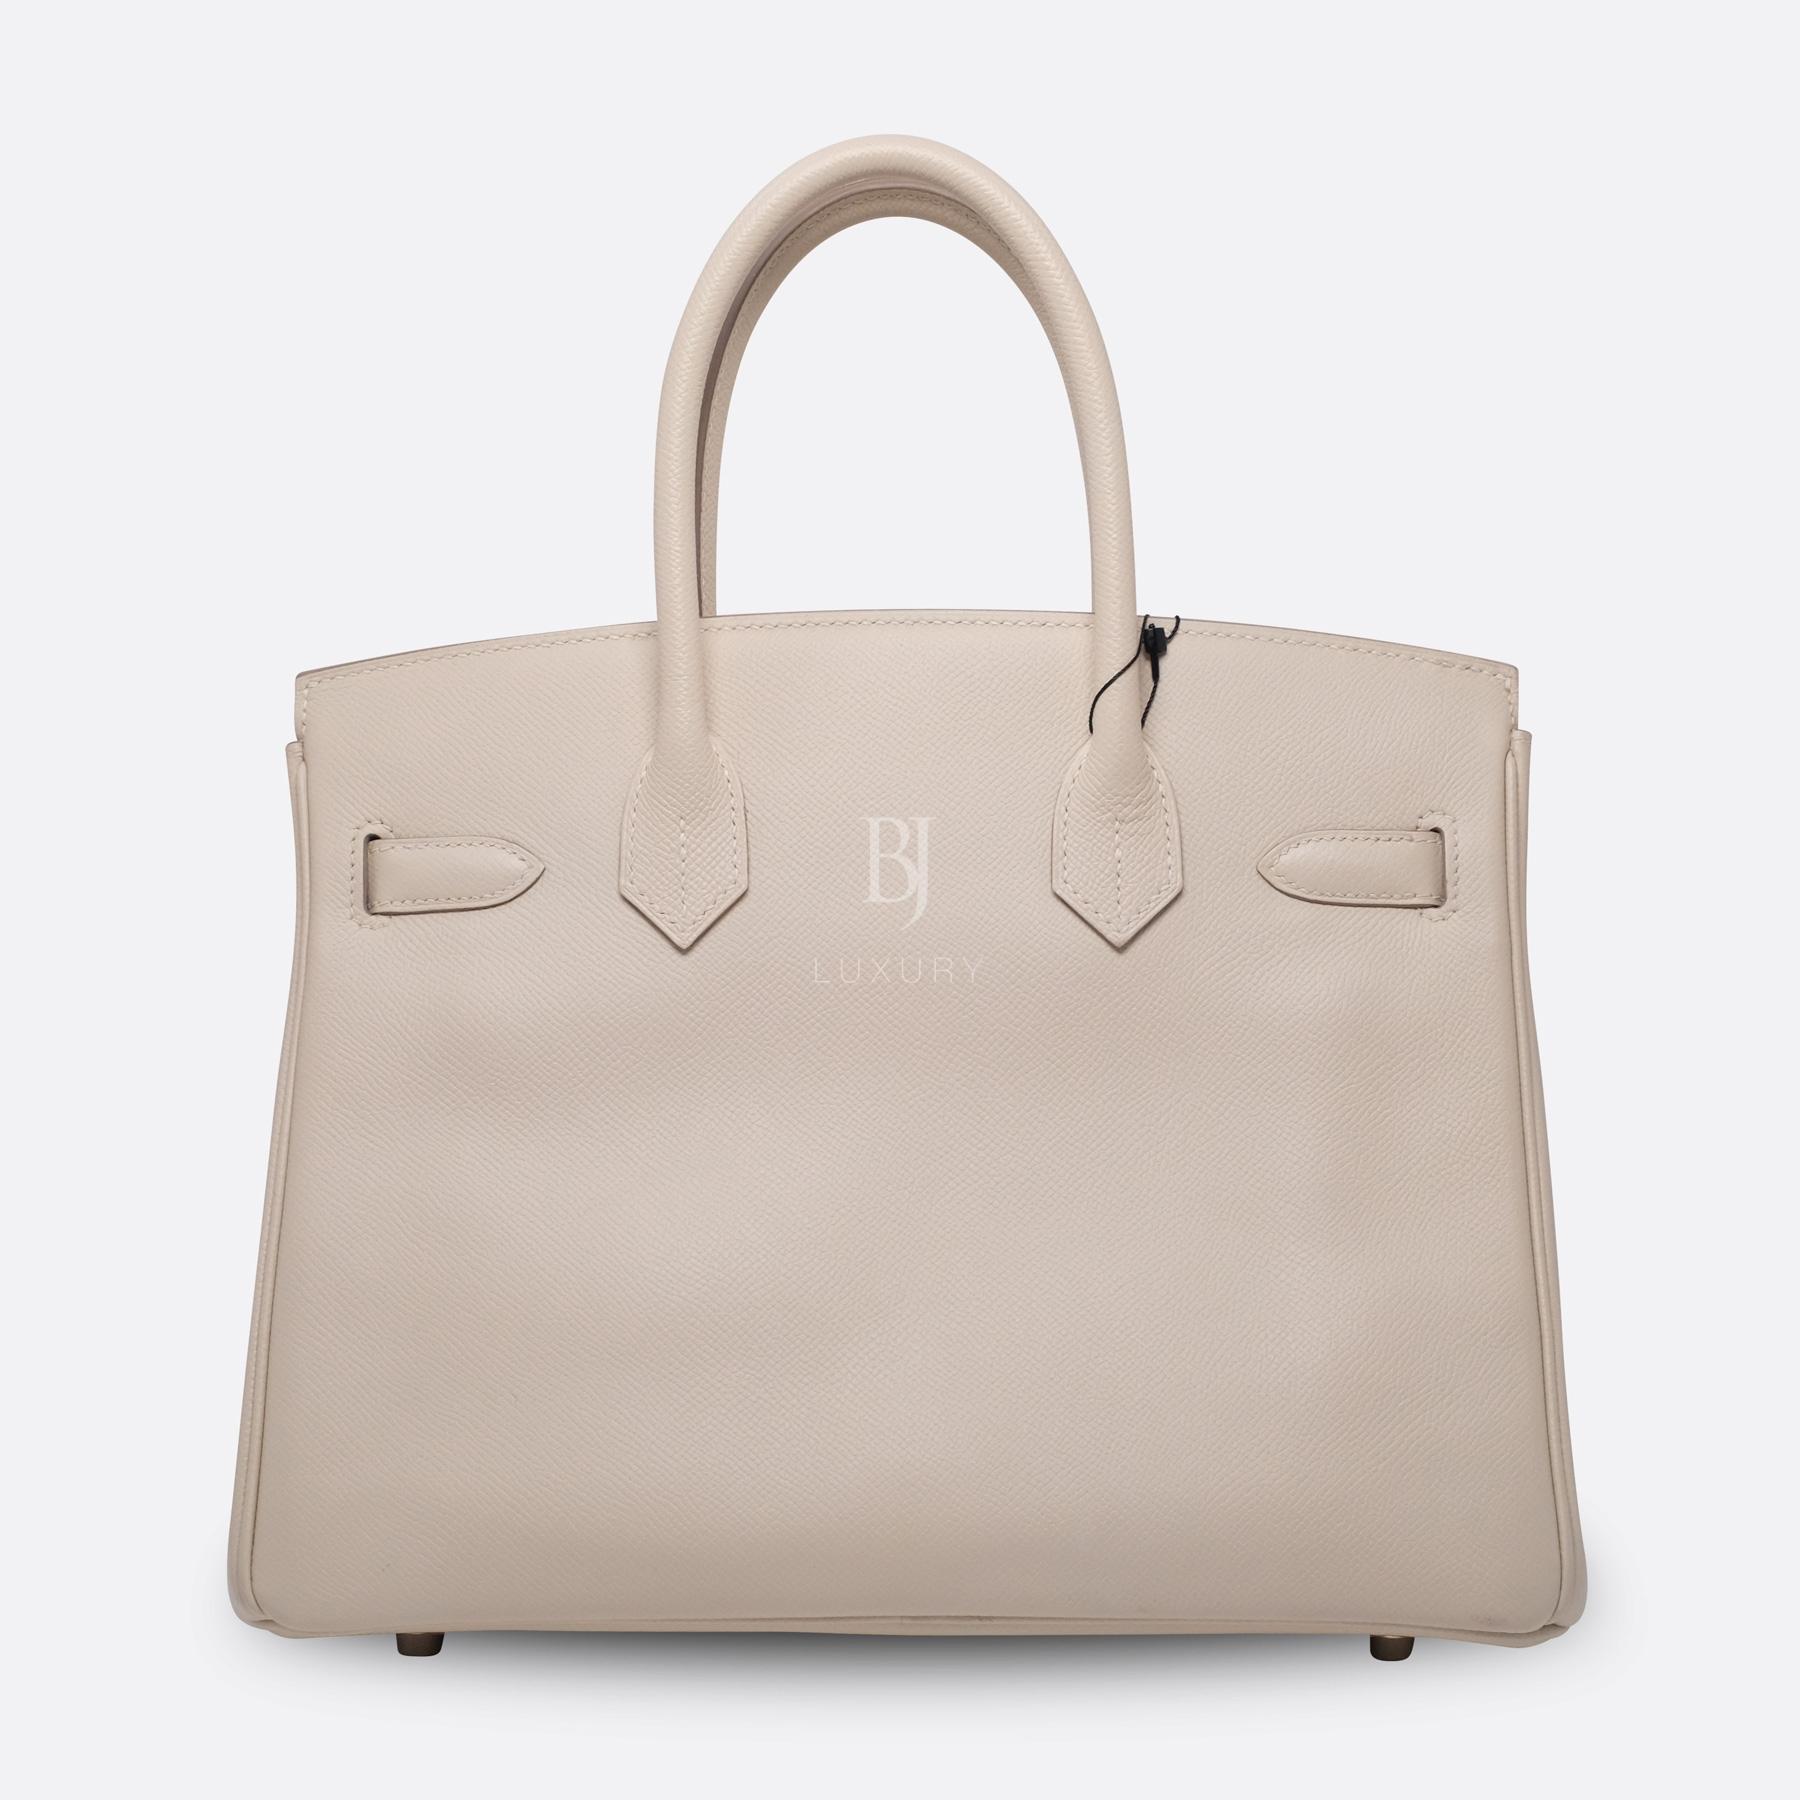 Hermes Birkin 30 Epsom Craie Palladium BJ Luxury 10.jpg